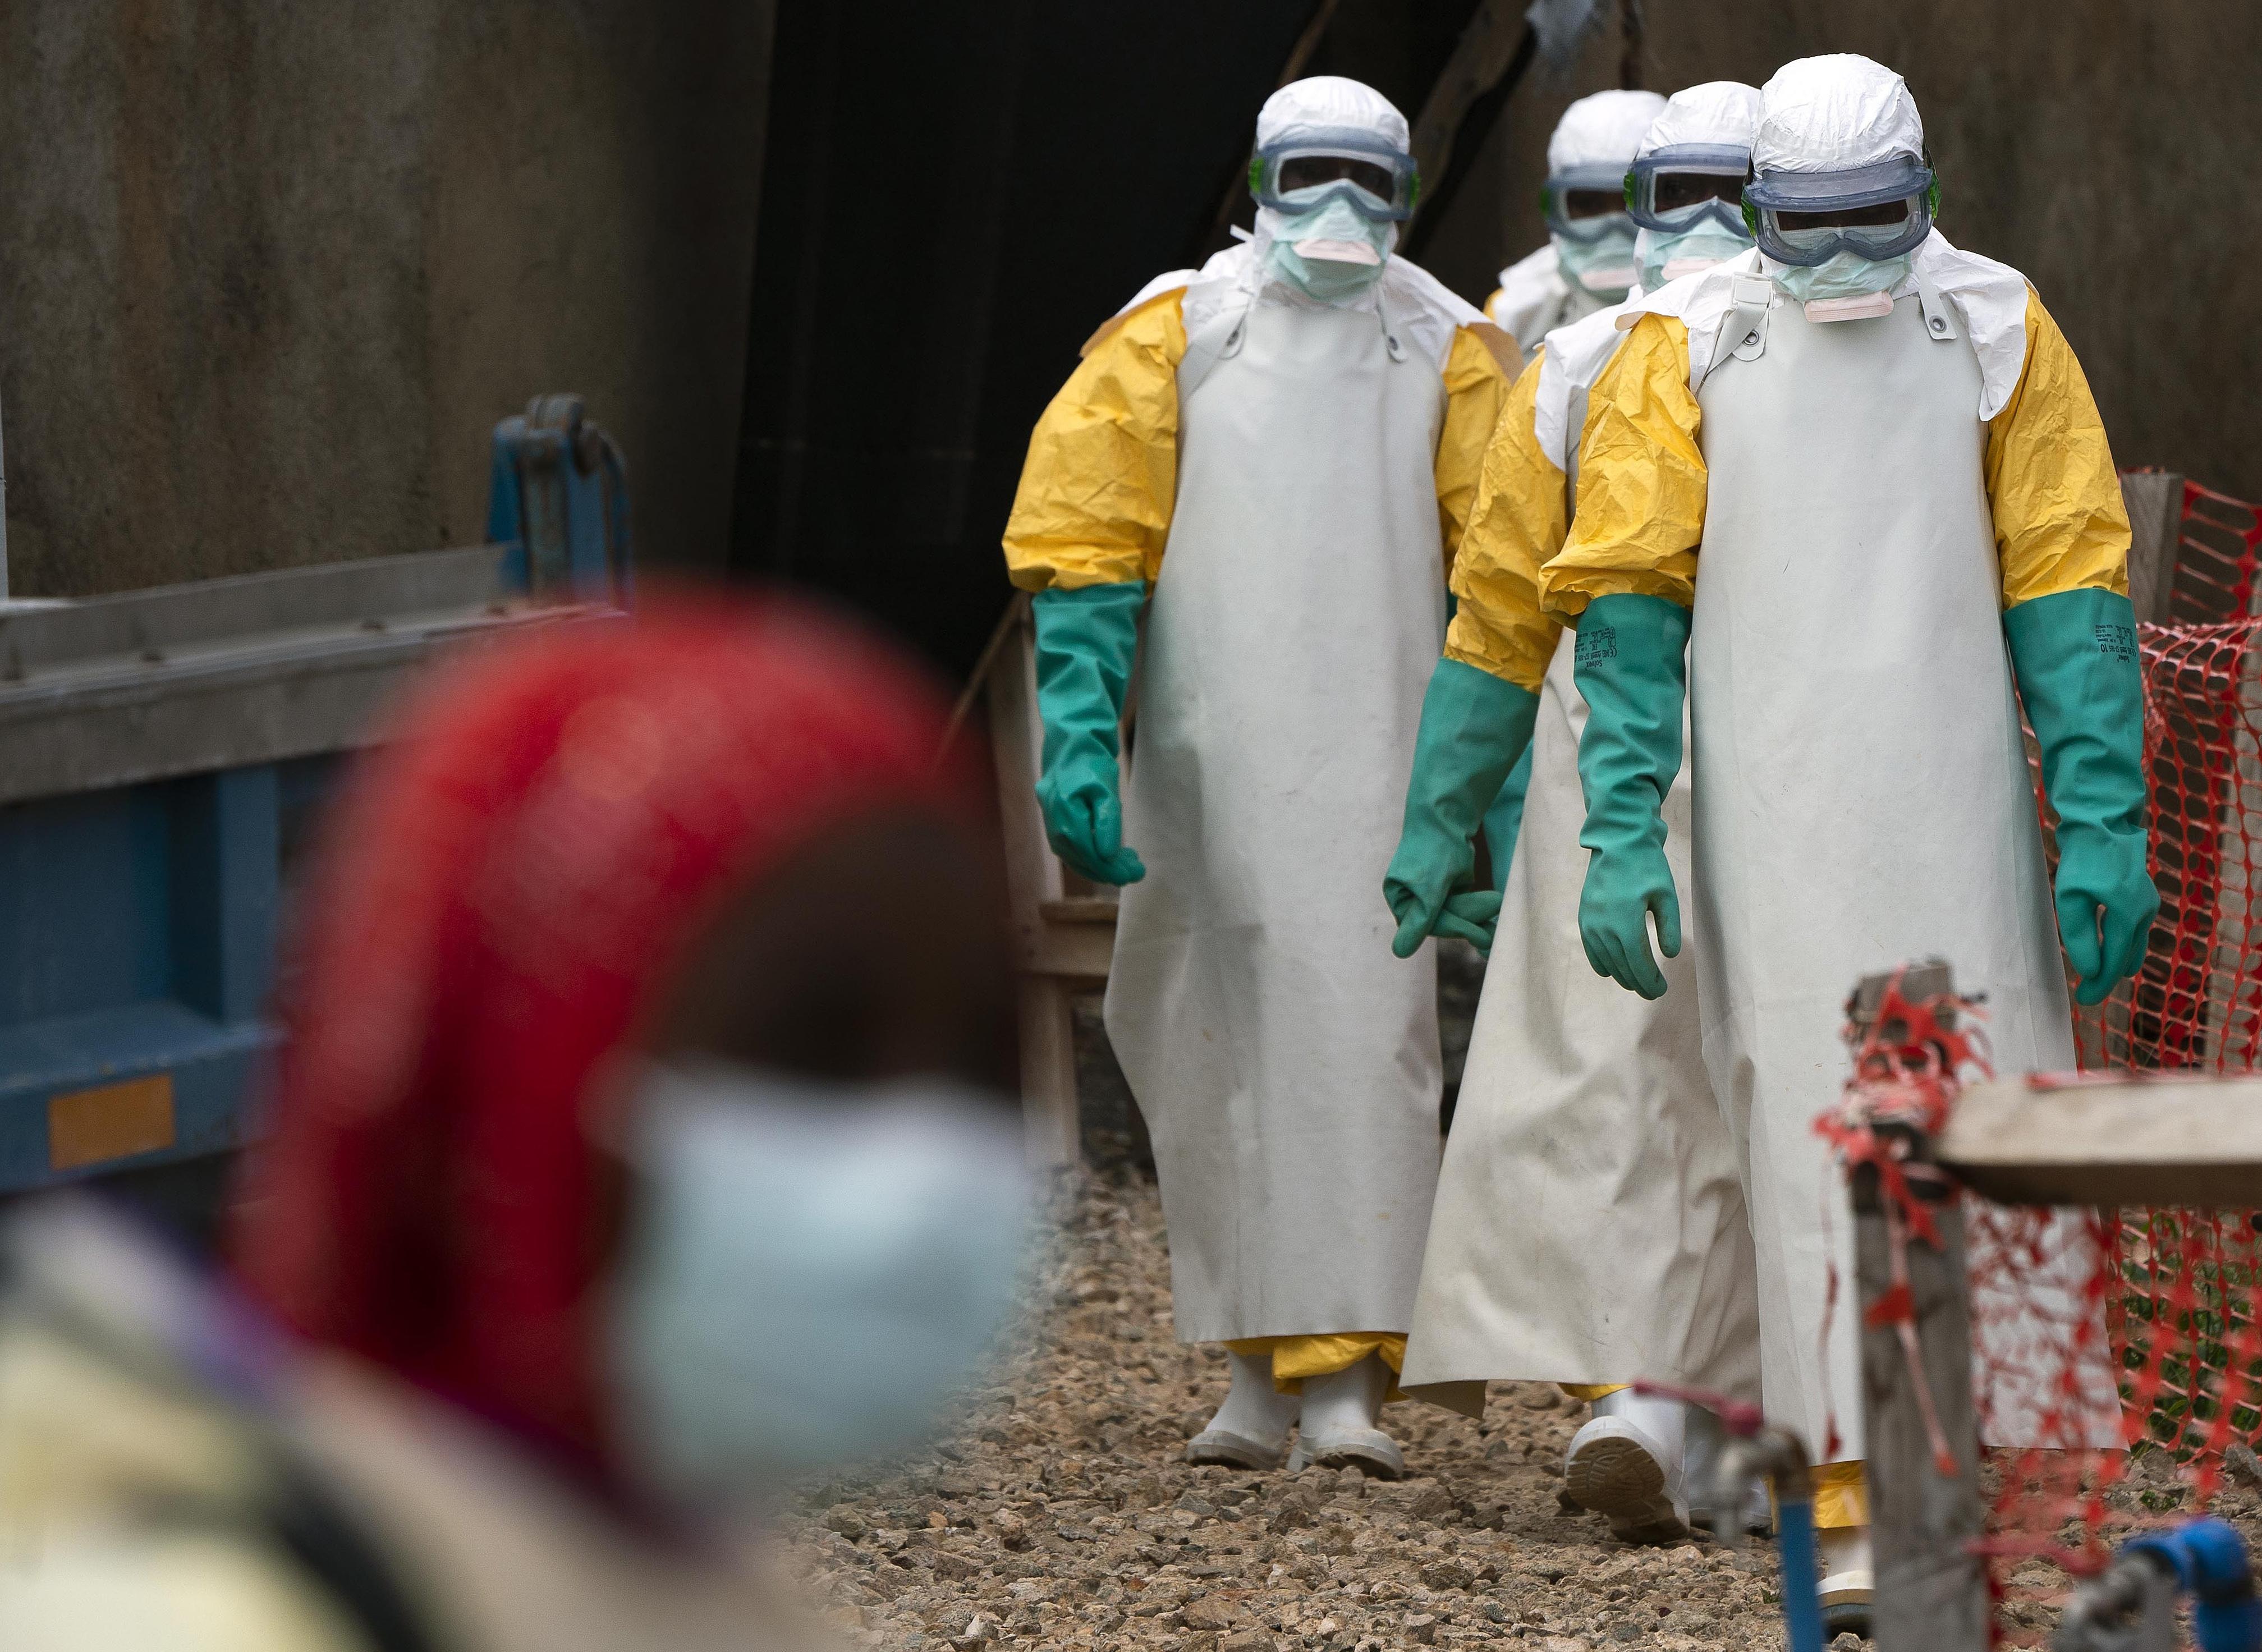 Congo soldiers, police to enforce Ebola emergency measures